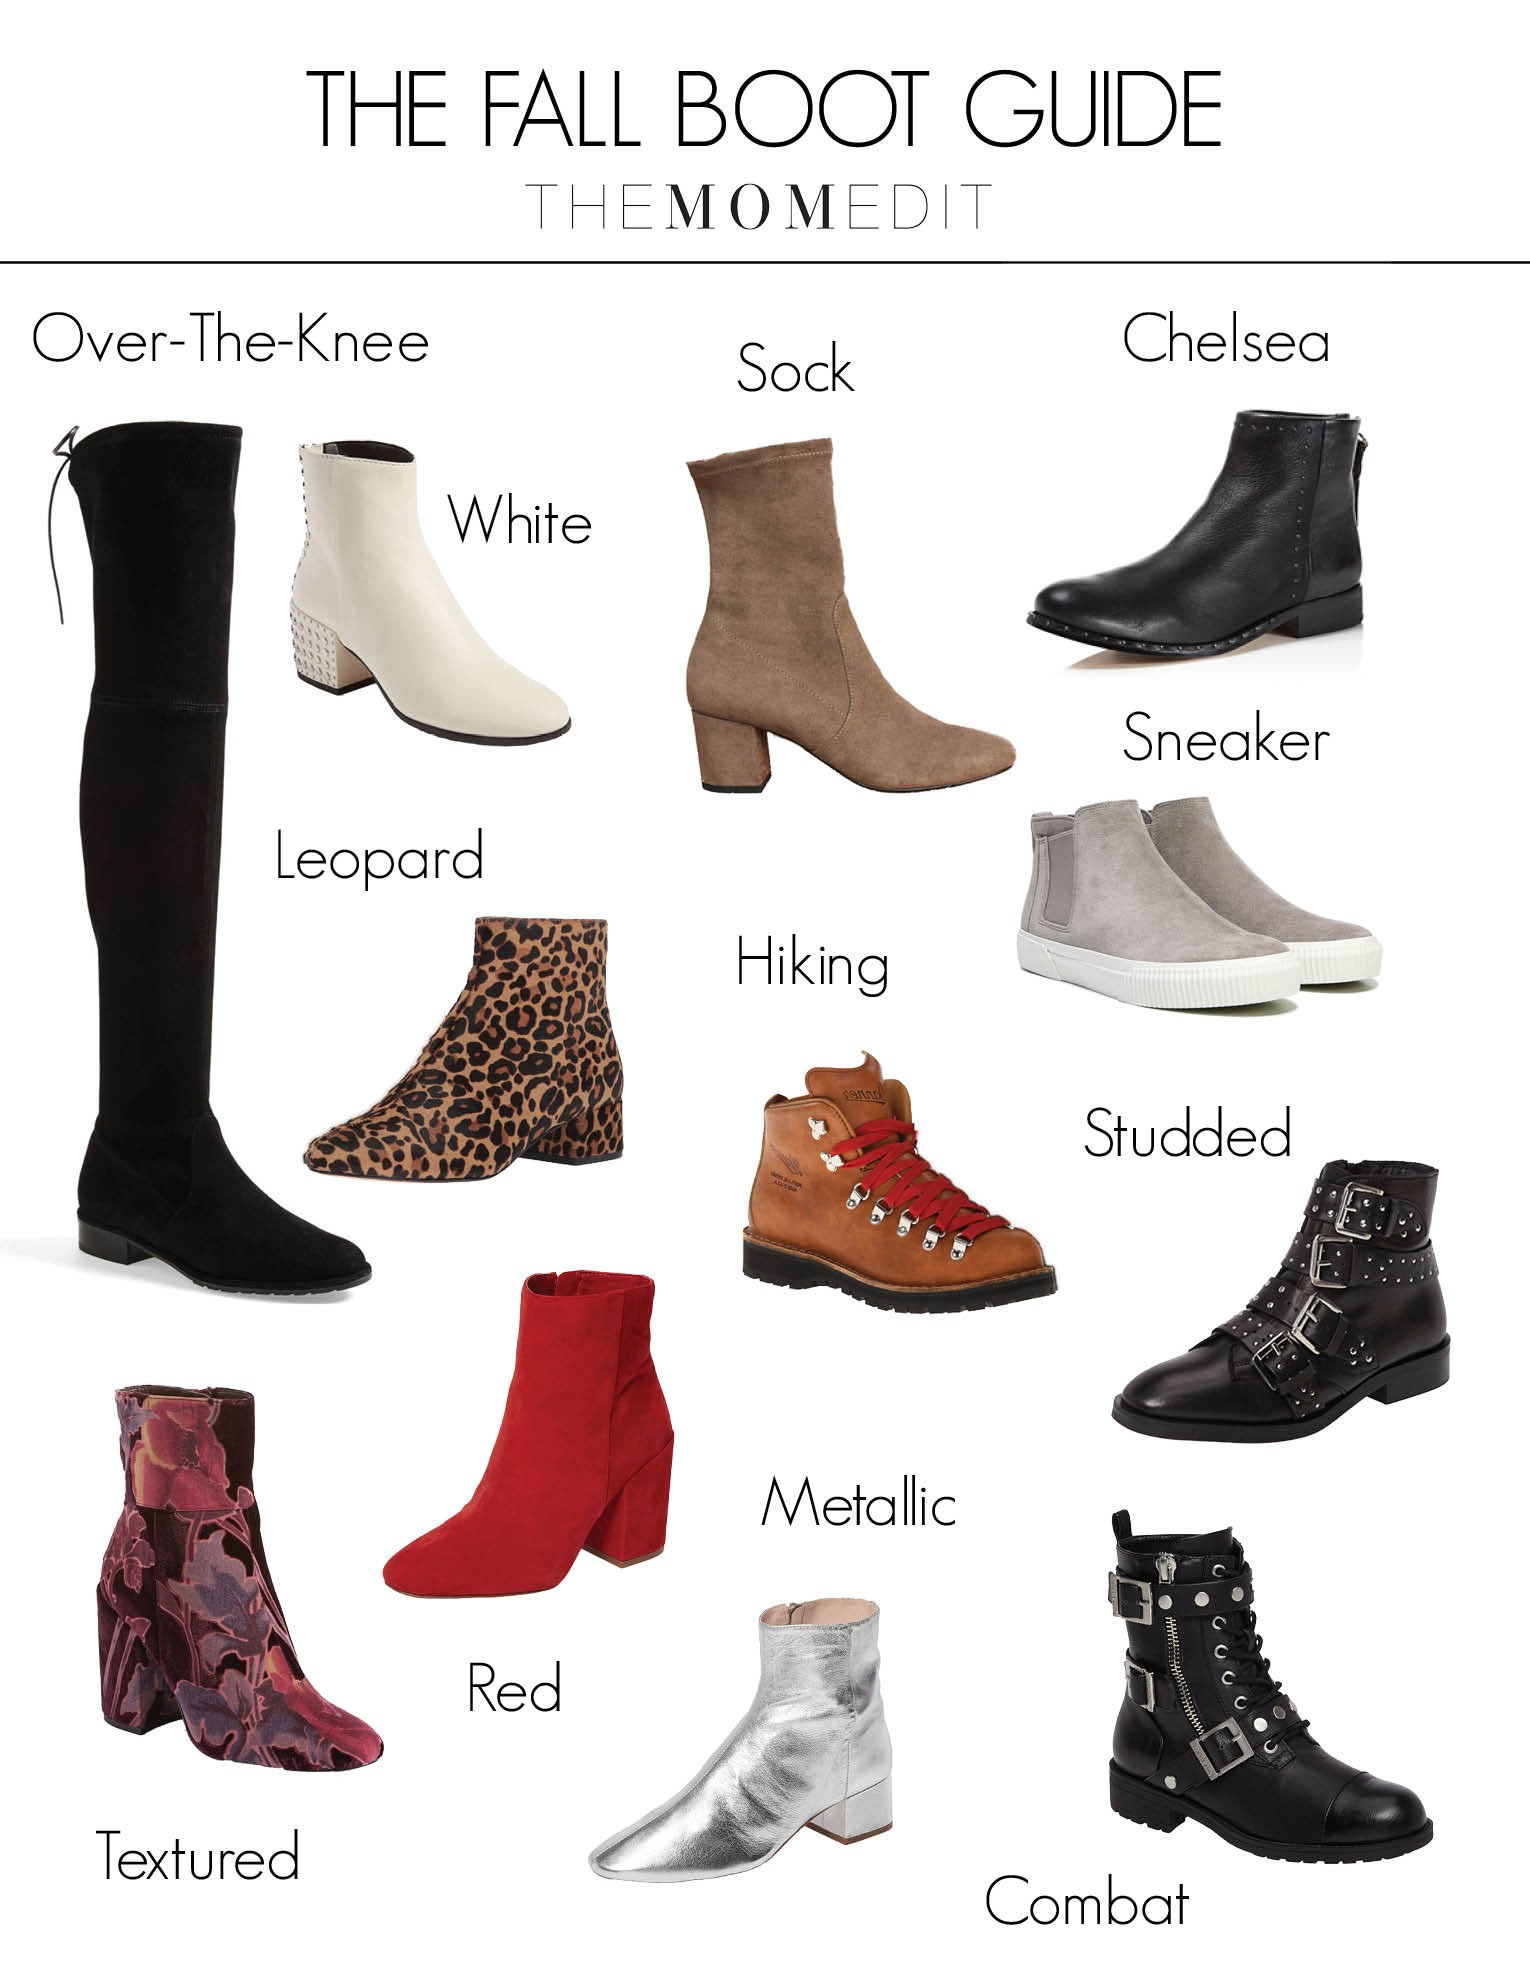 c21cb88e579 The Fall Boots Shop - The Mom Edit